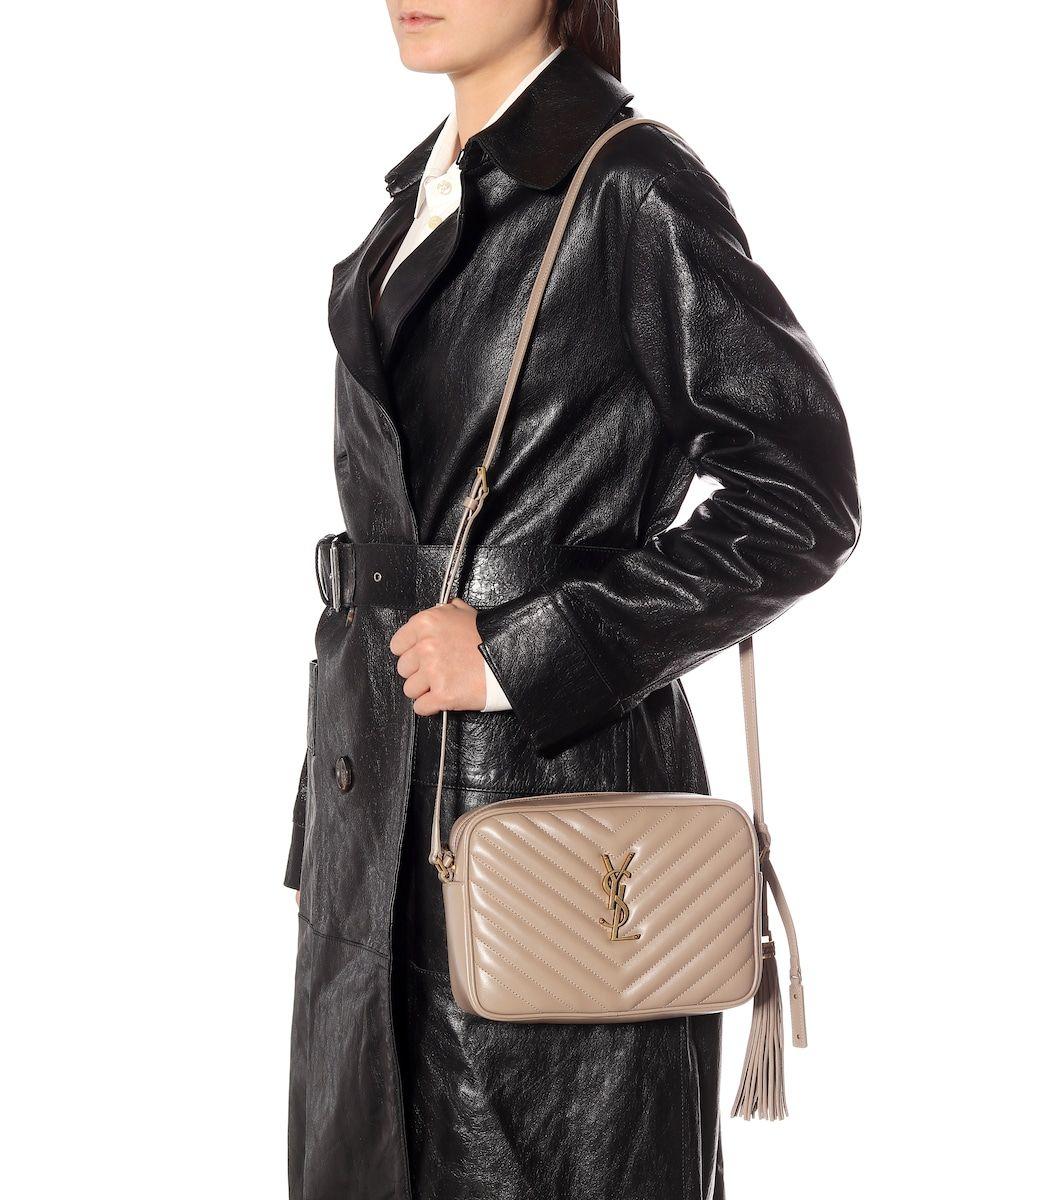 Ysl Mini Lou Camera Bag Saint Laurent 2020 01 20